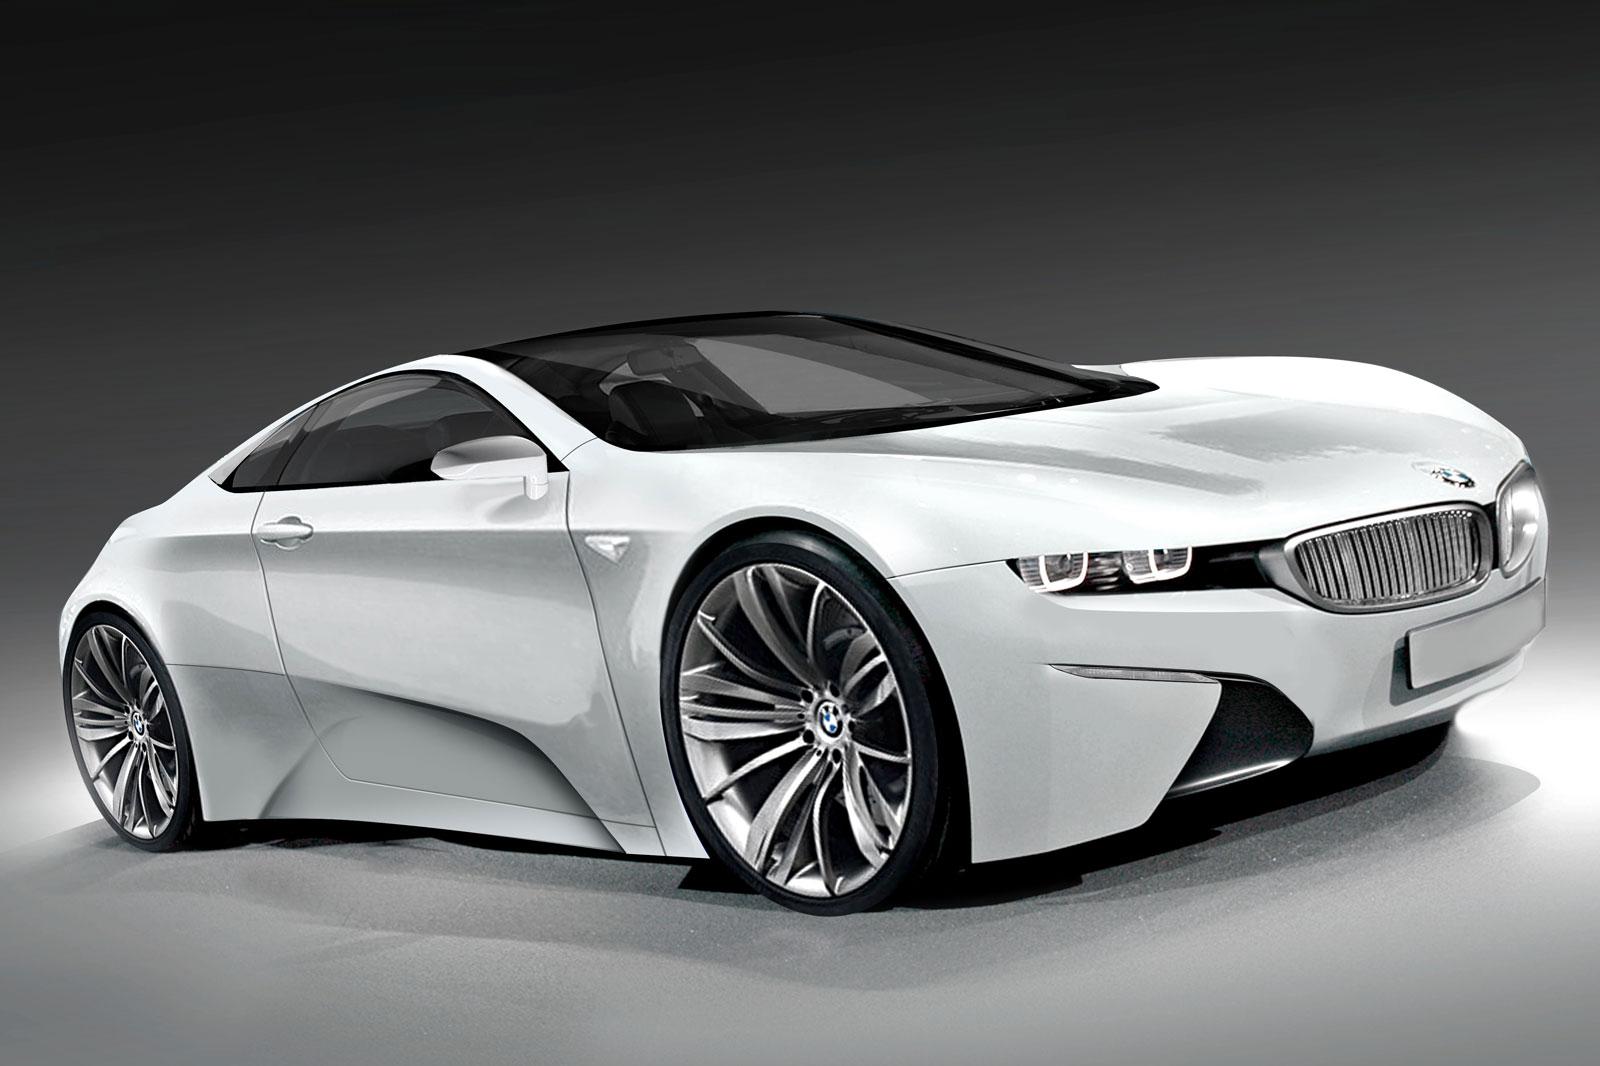 bmw m1 concept cars - photo #23